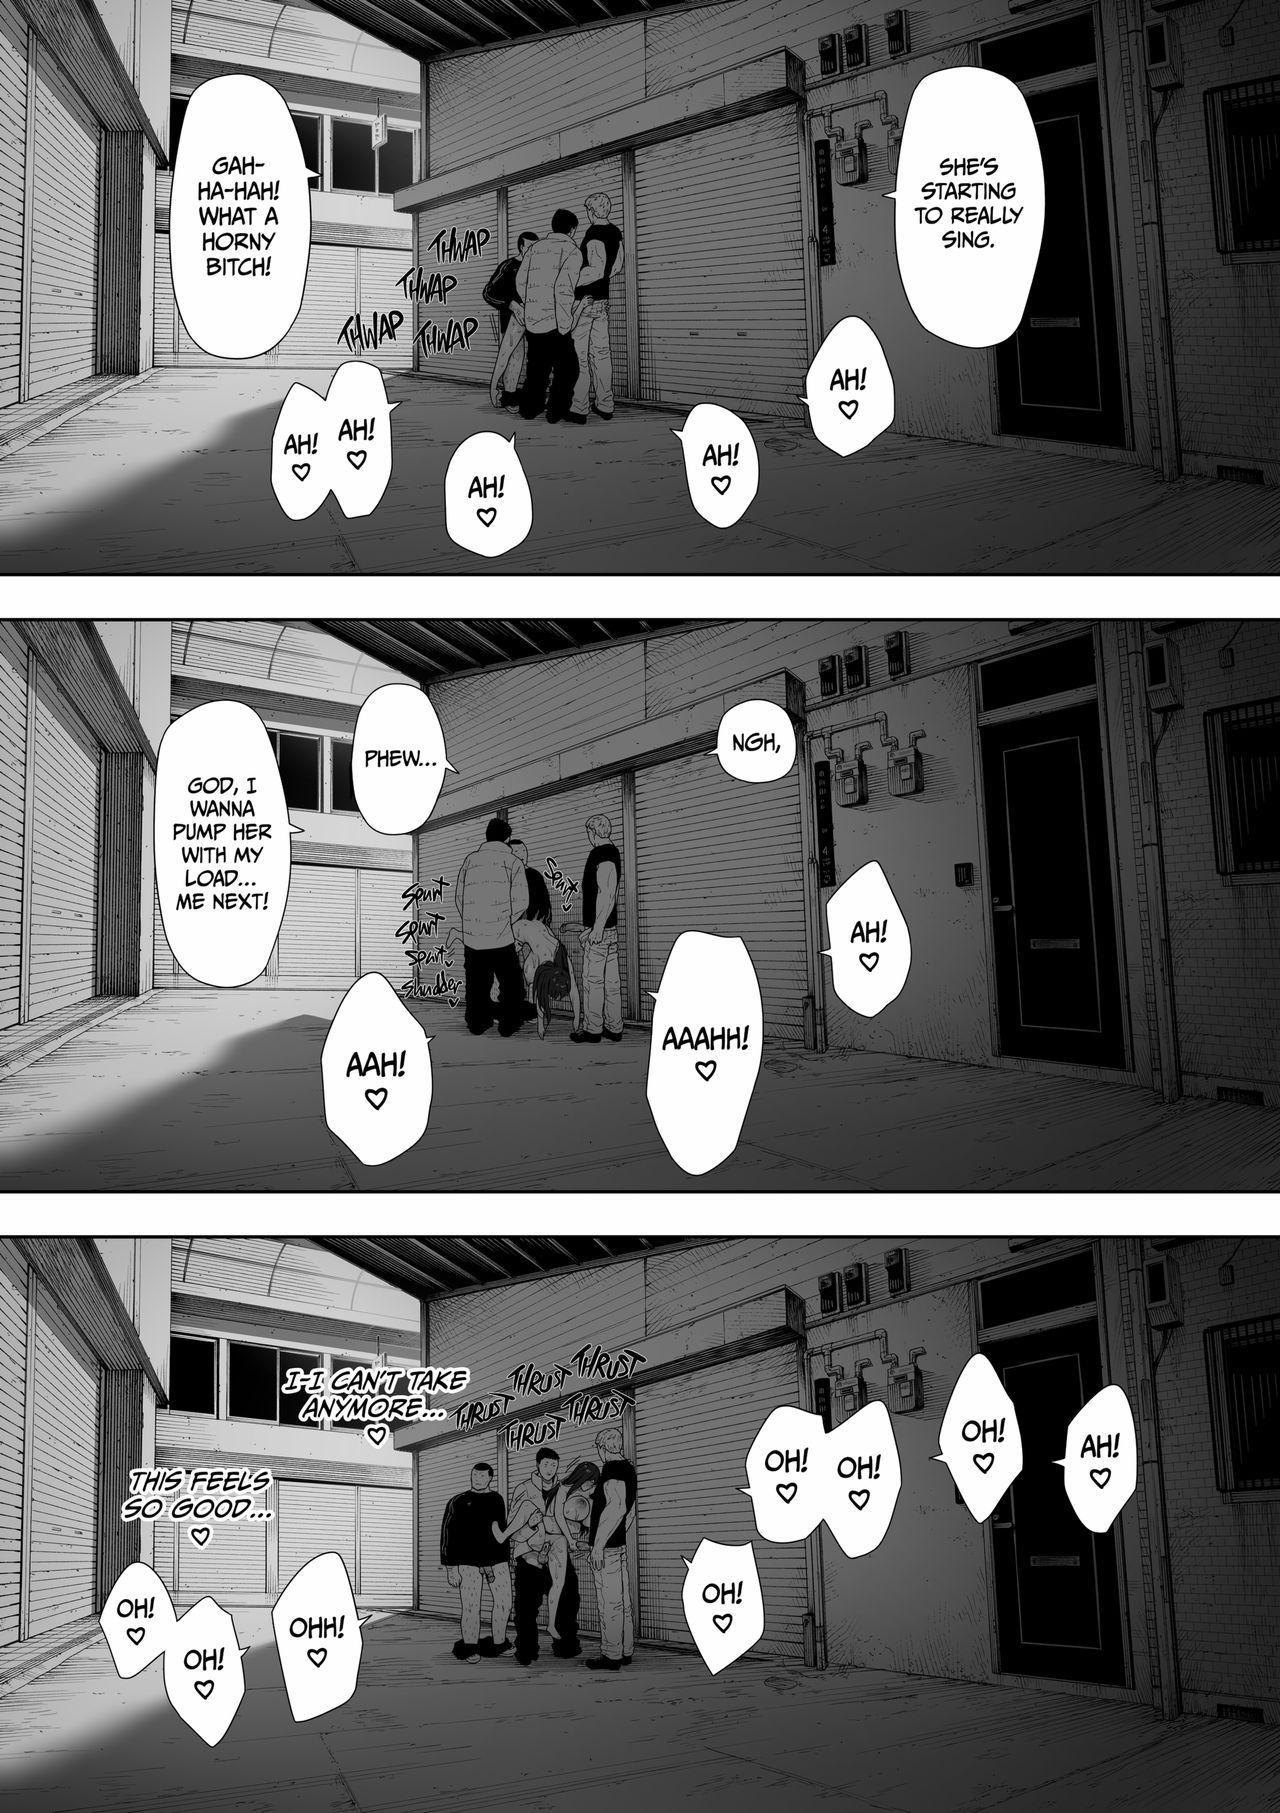 [NT Labo (NT Robo)] Aisai, Doui no Ue, Netorare Roshutsu | [NT Labo(NT Robo)] Cucked With_My Consent My Exhibitionist Wife [English] 61